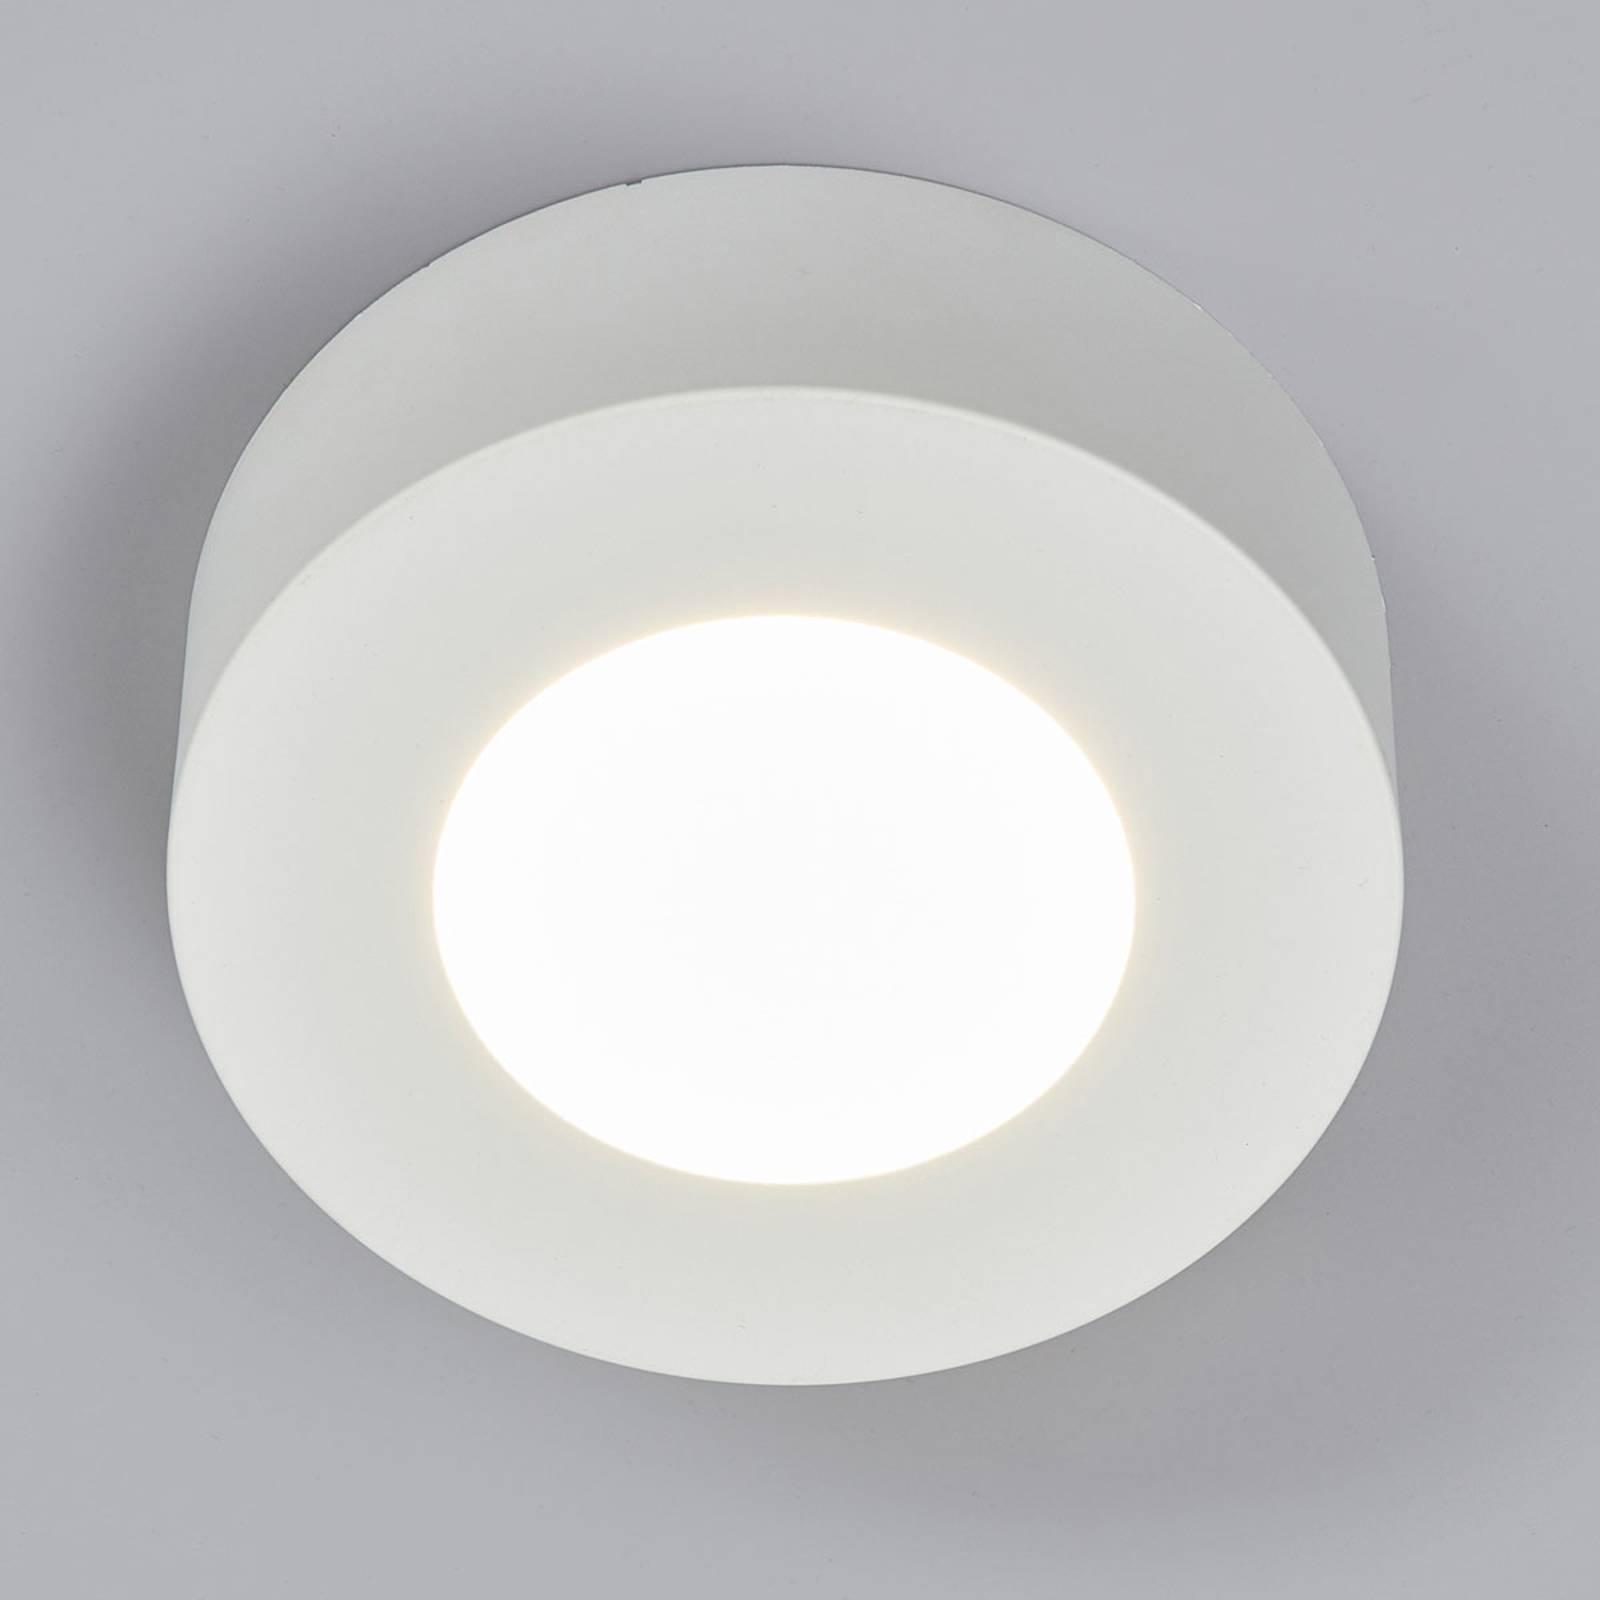 Plafoniera Marlo bianco 4000K rotonda 12,8cm